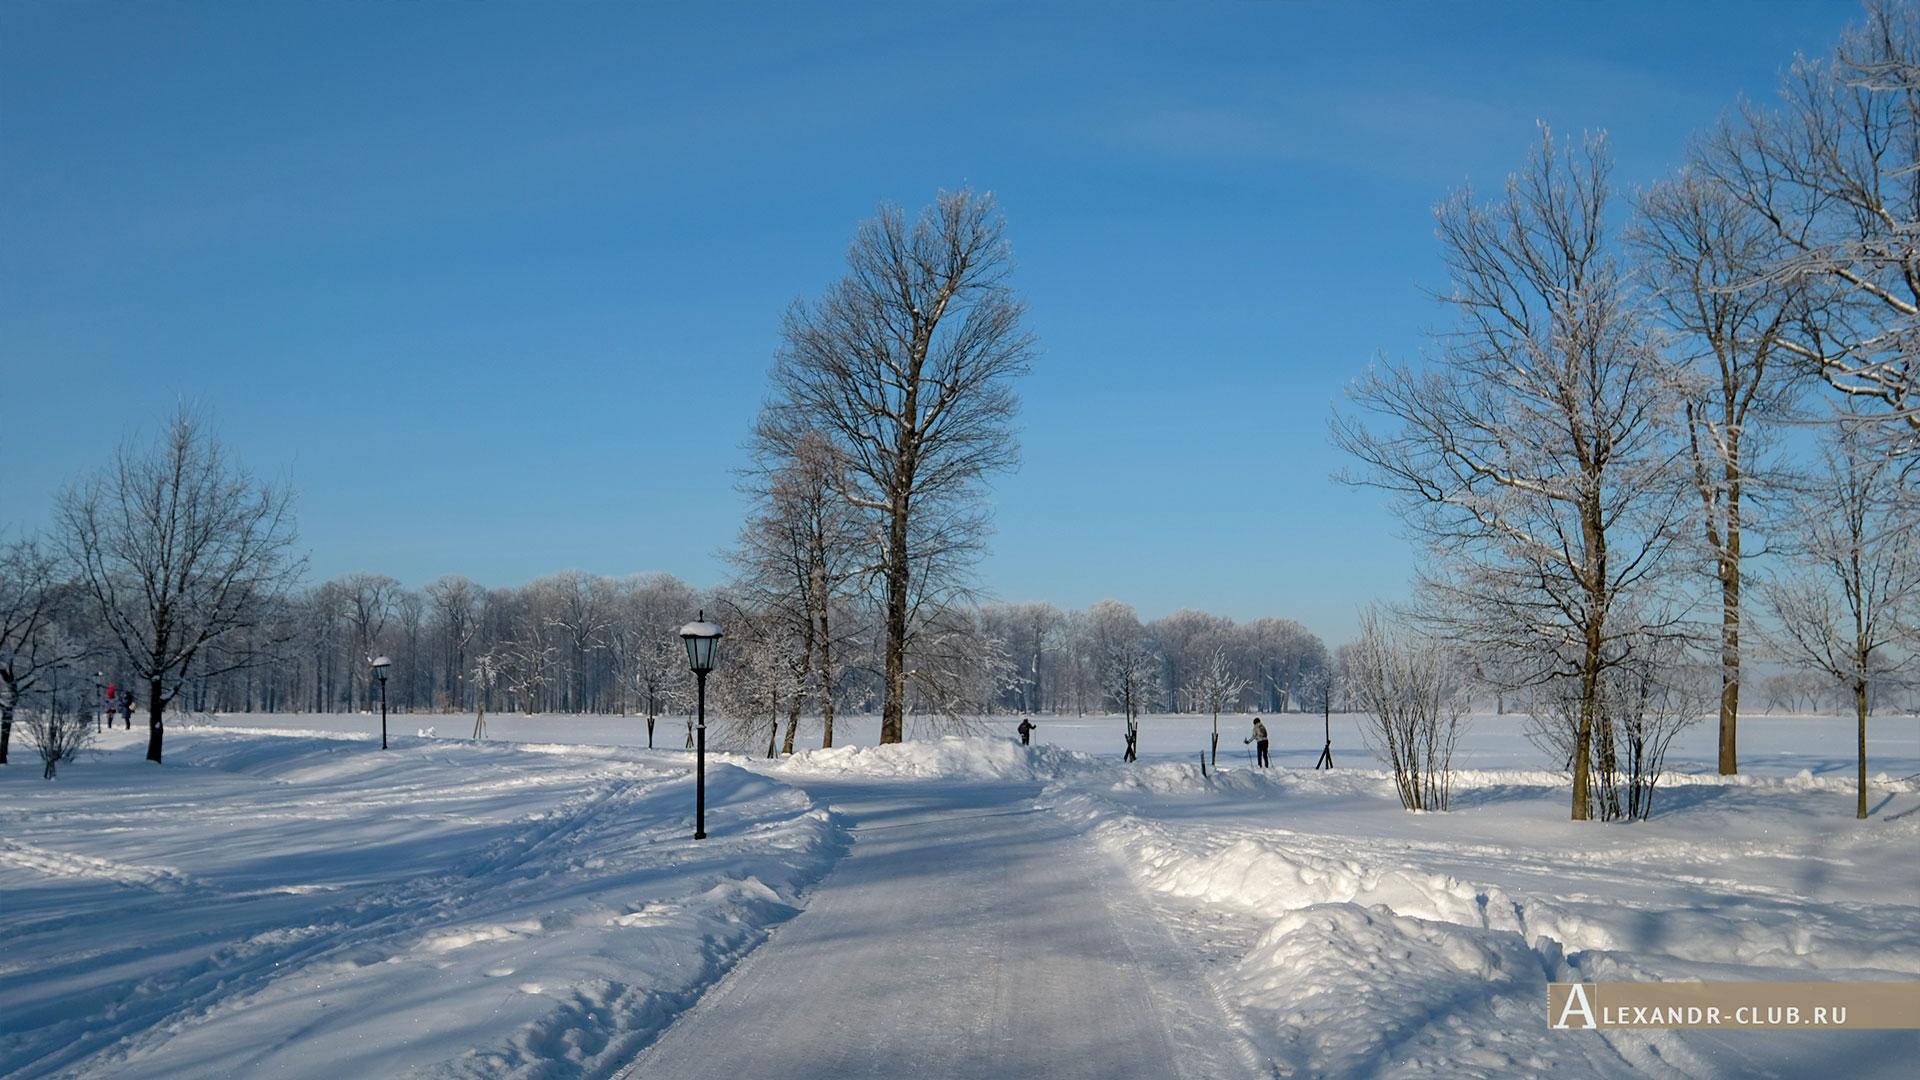 Петергоф, зима, парк «Александрия»